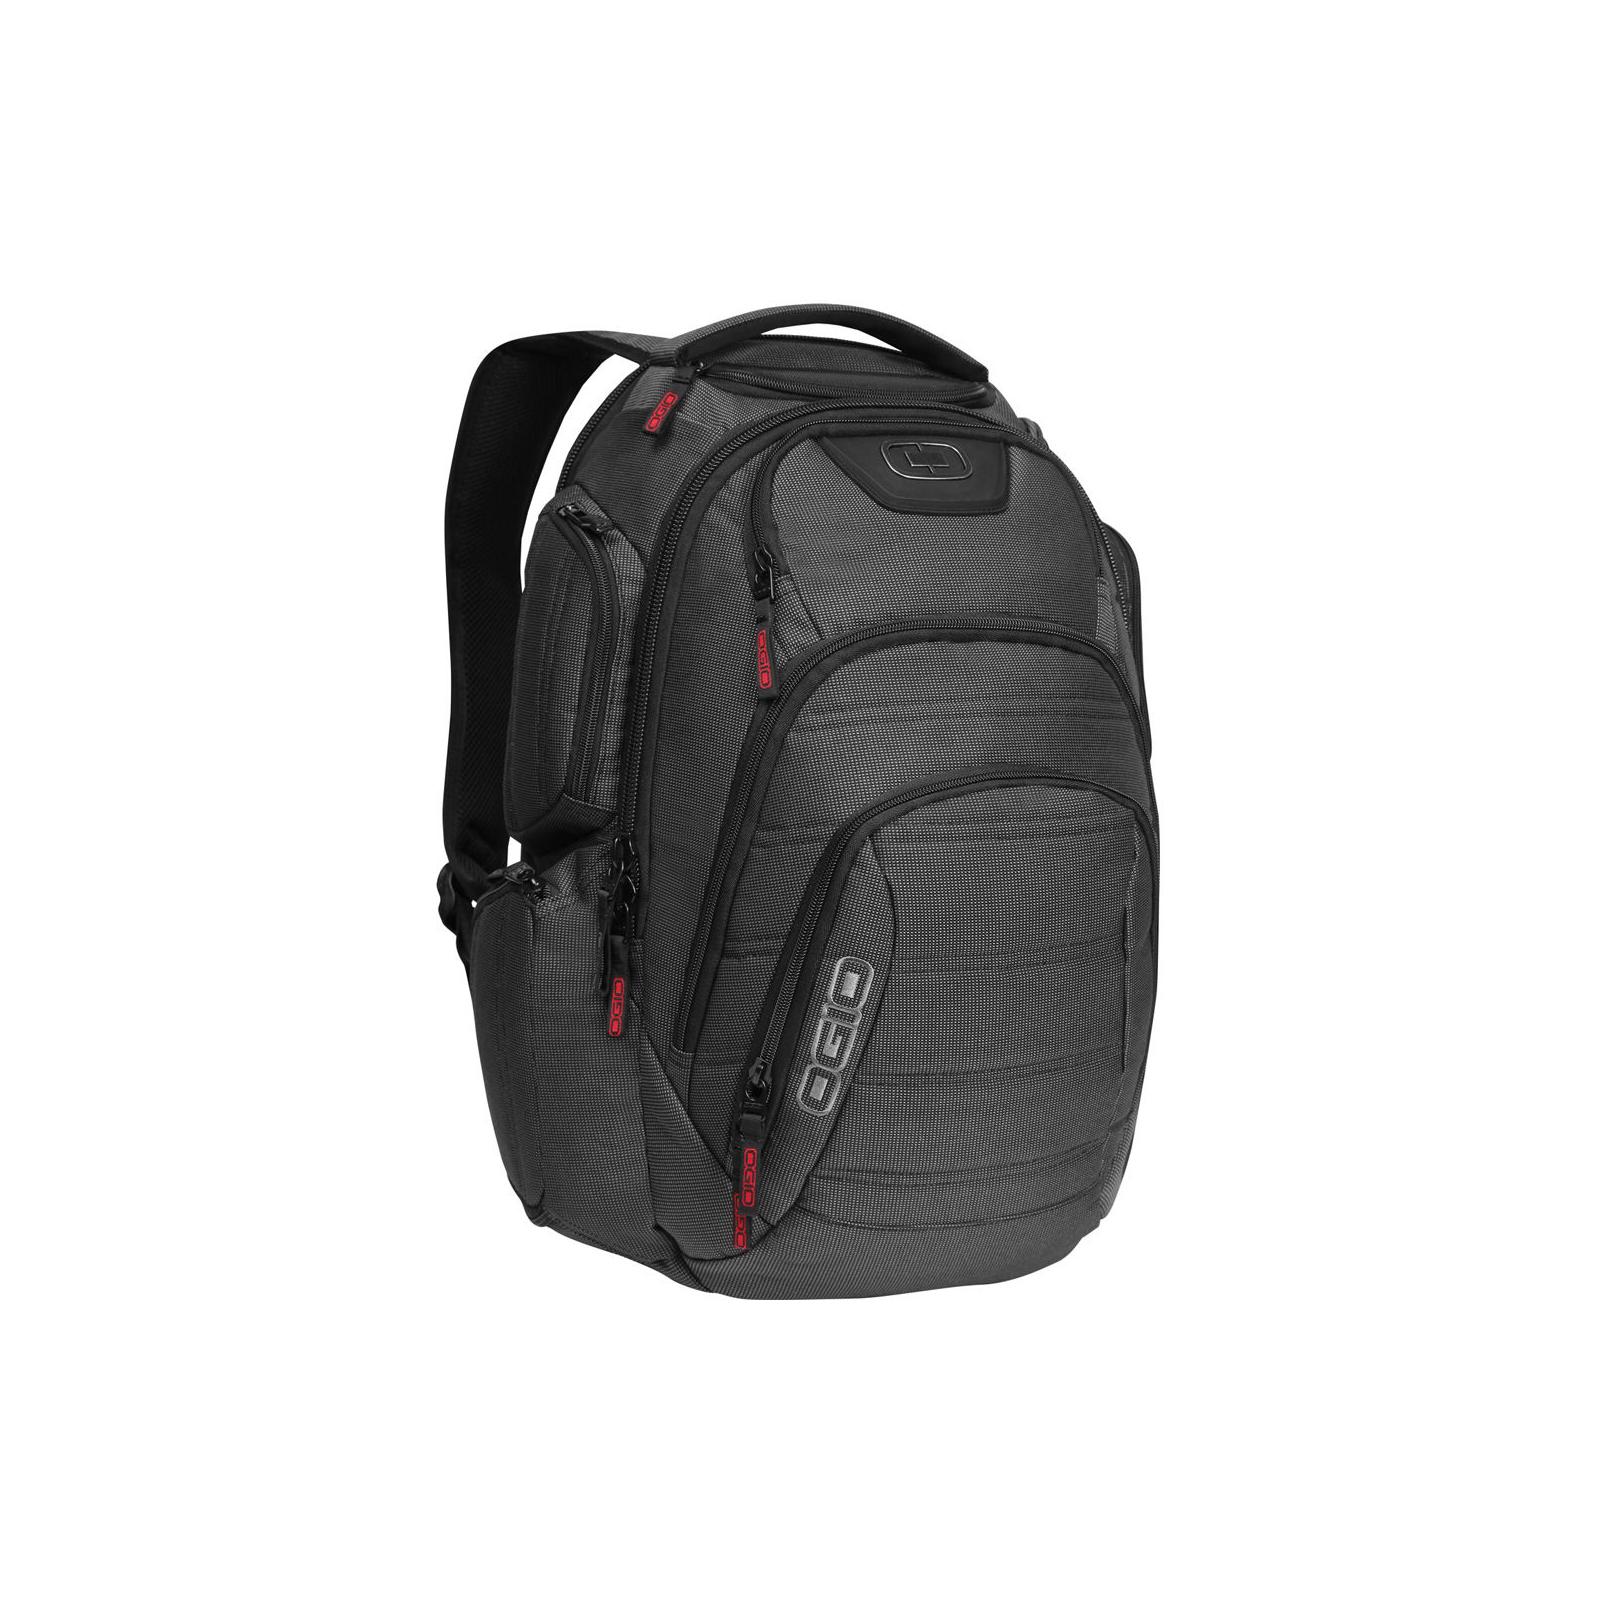 "Рюкзак для ноутбука Ogio 17"" RENEGADE RSS 17 - Black Pindot (111071.317)"